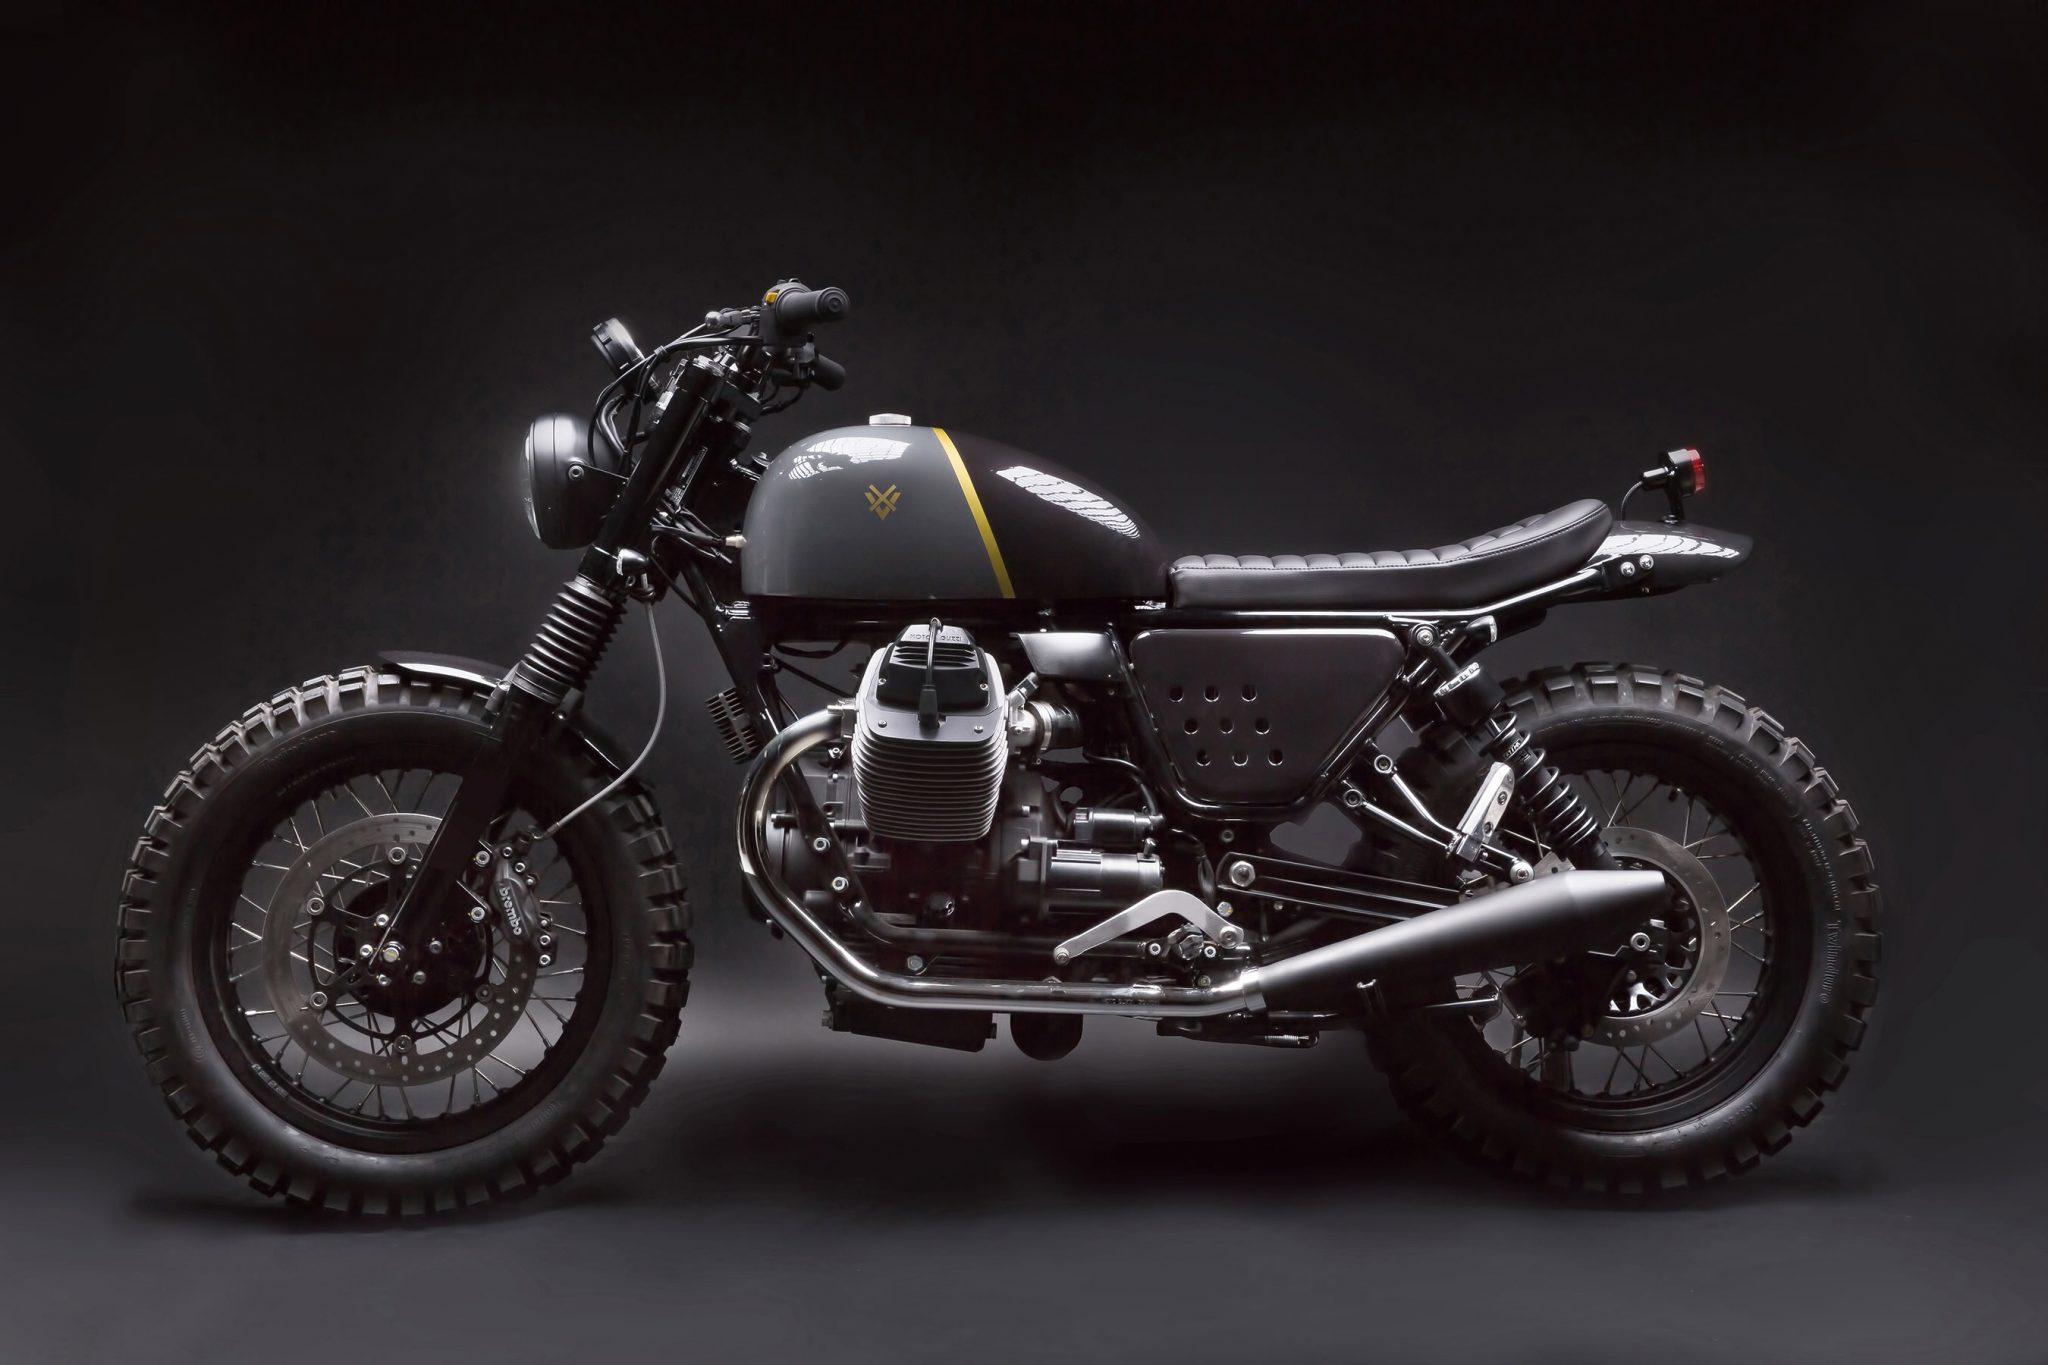 Moto Guzzi V Stone Aftermarket Parts